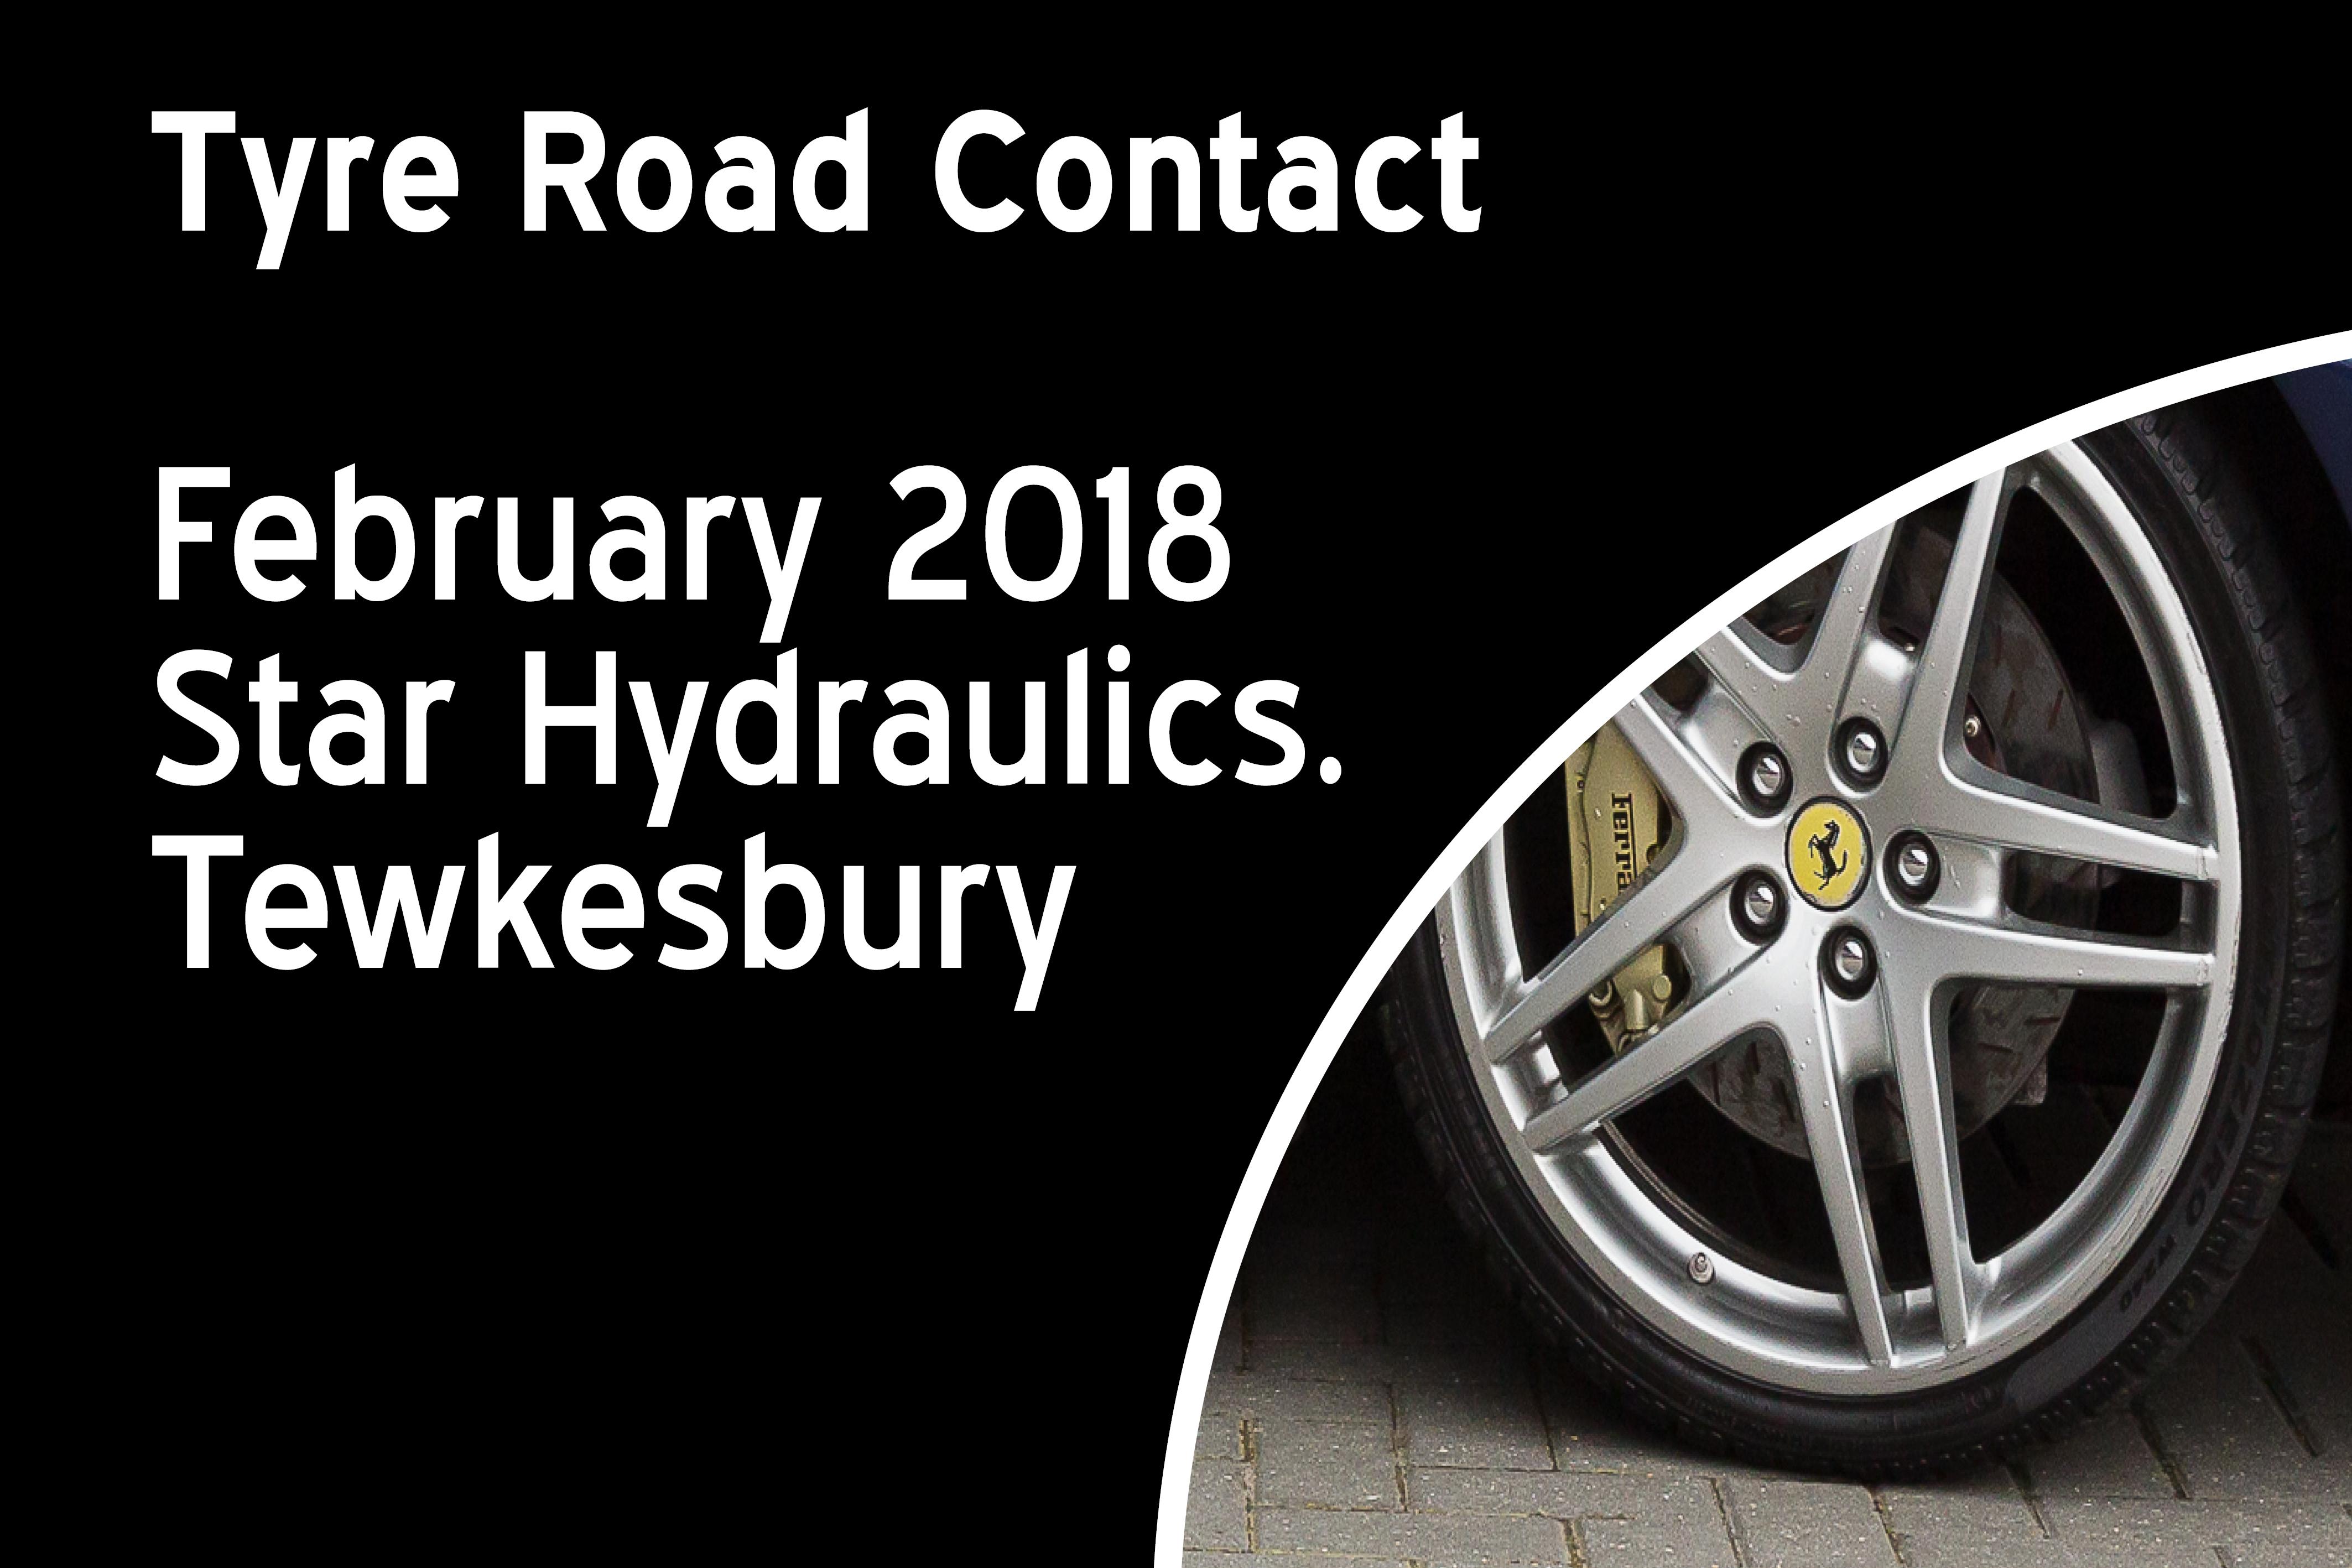 20180118 Tyre Road